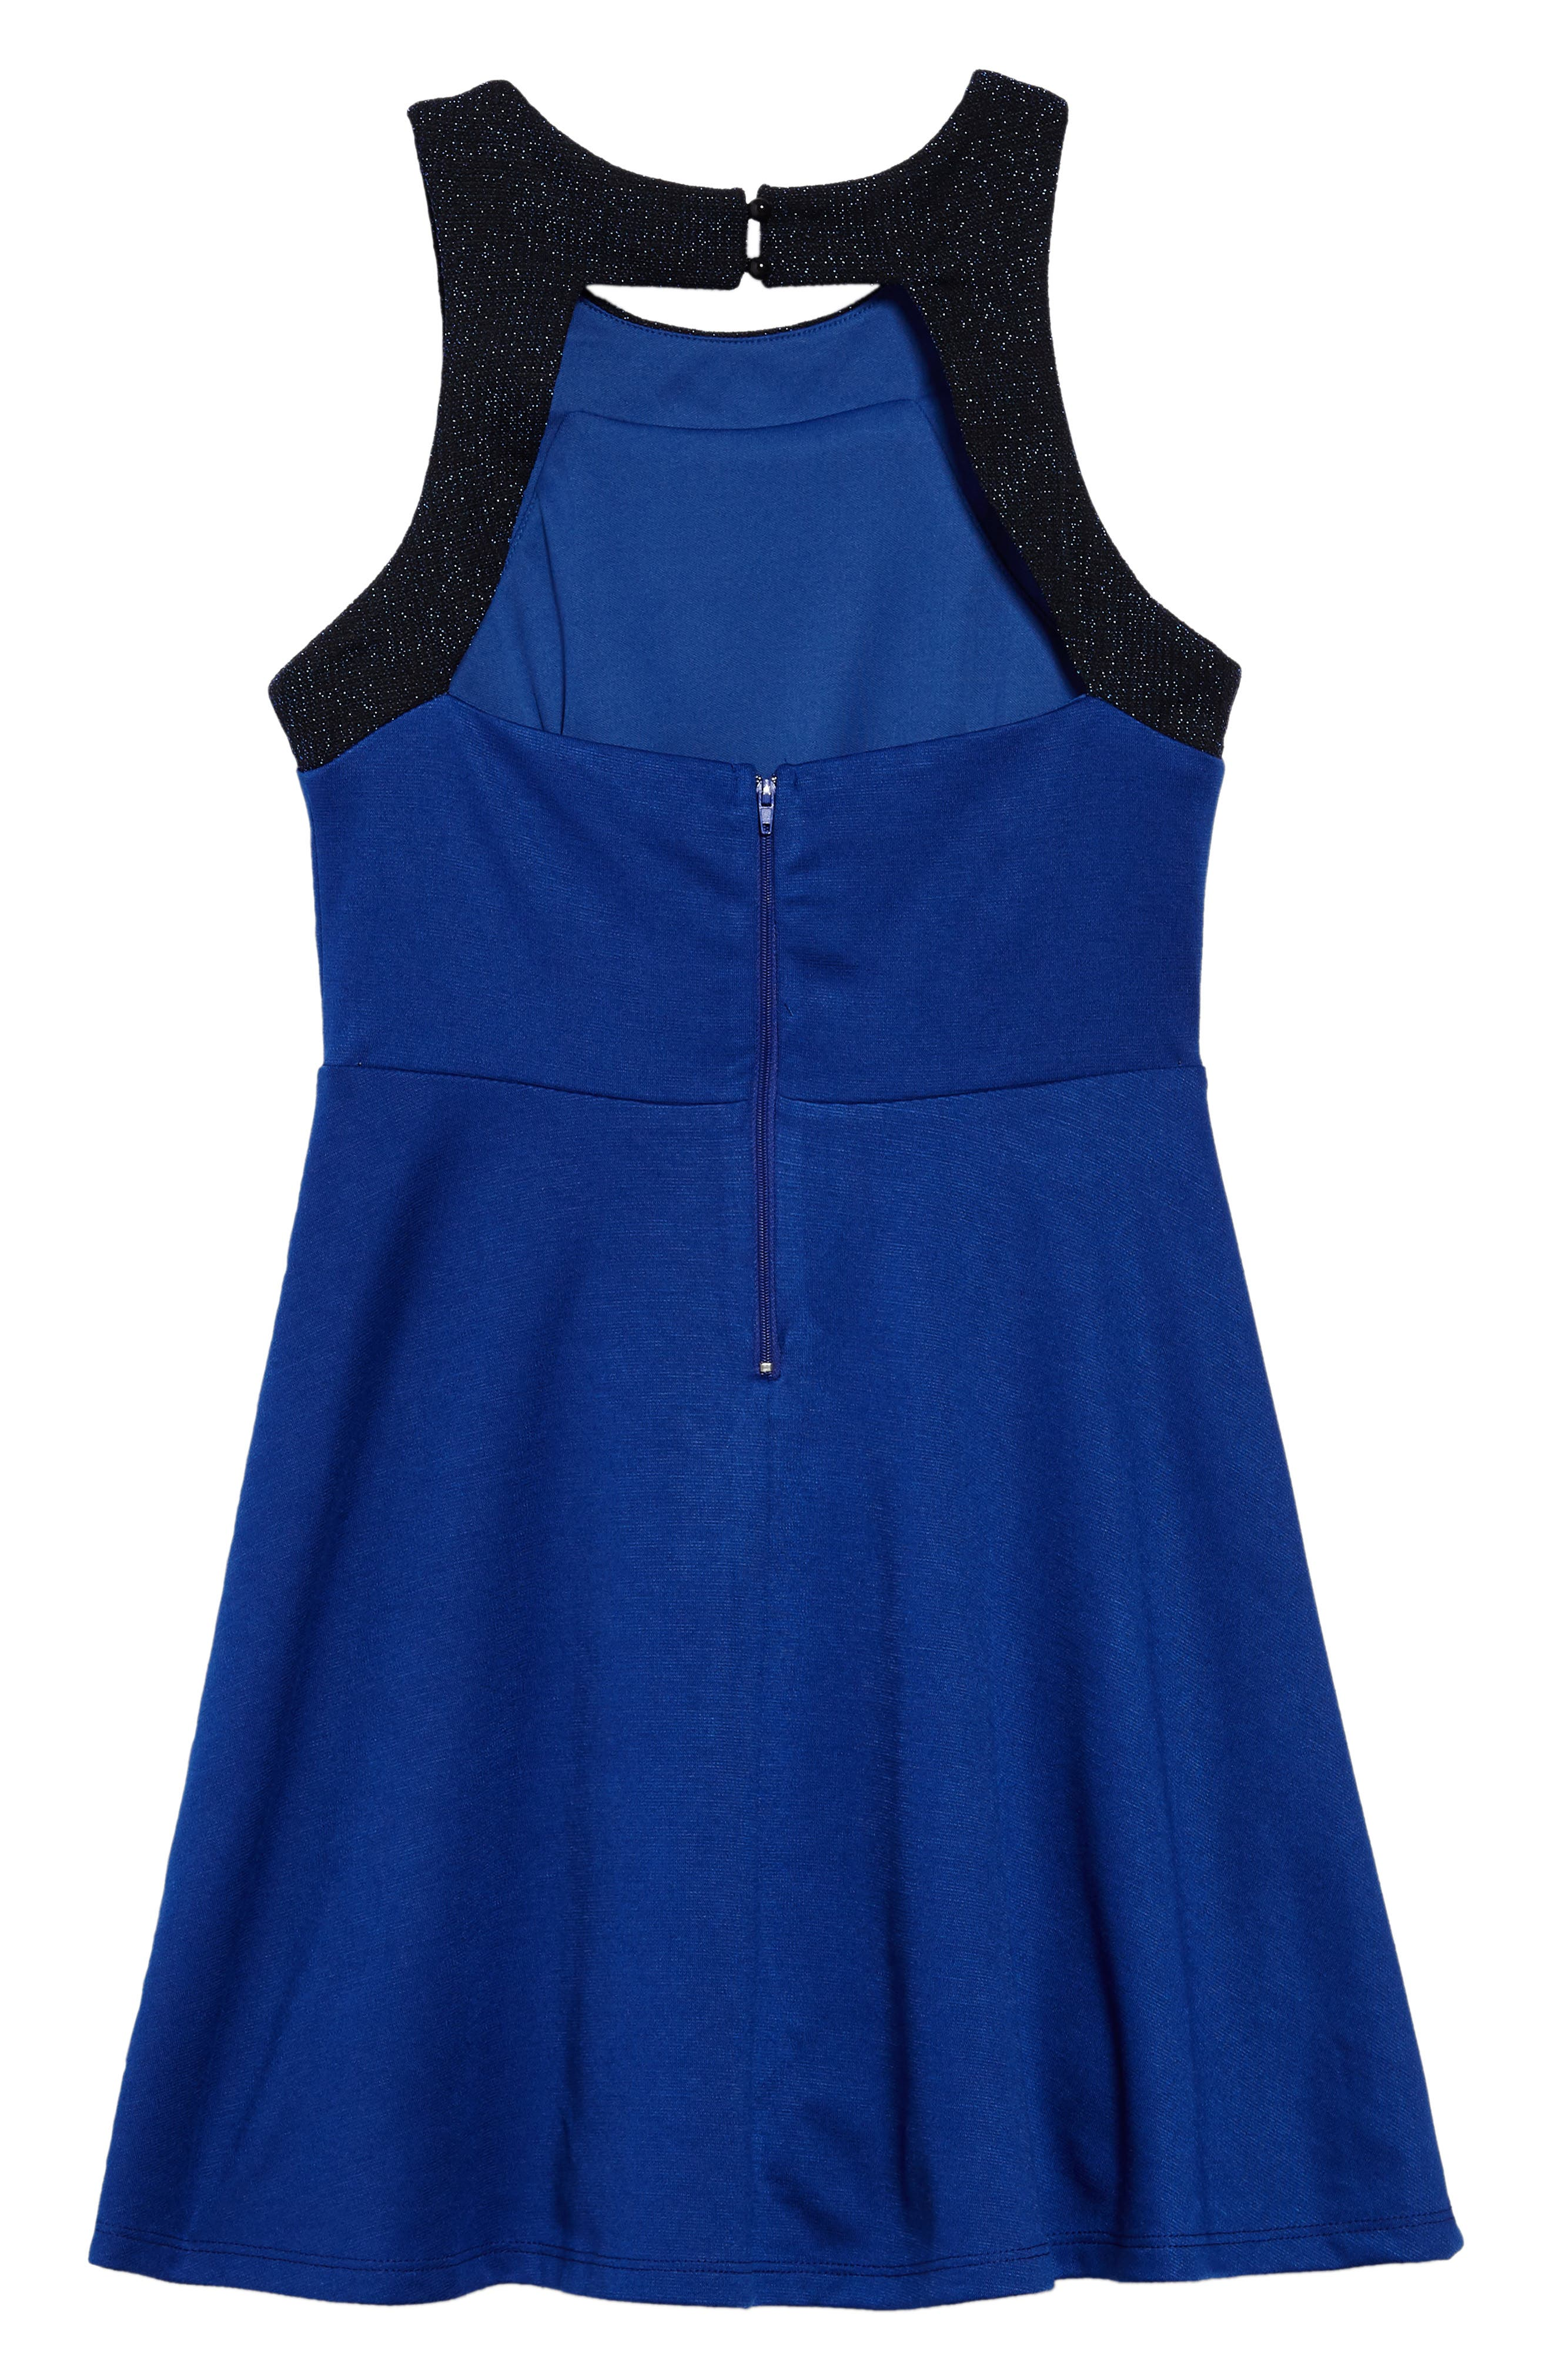 Alternate Image 2  - Penelope Tree Heather Open Back Dress (Big Girls)